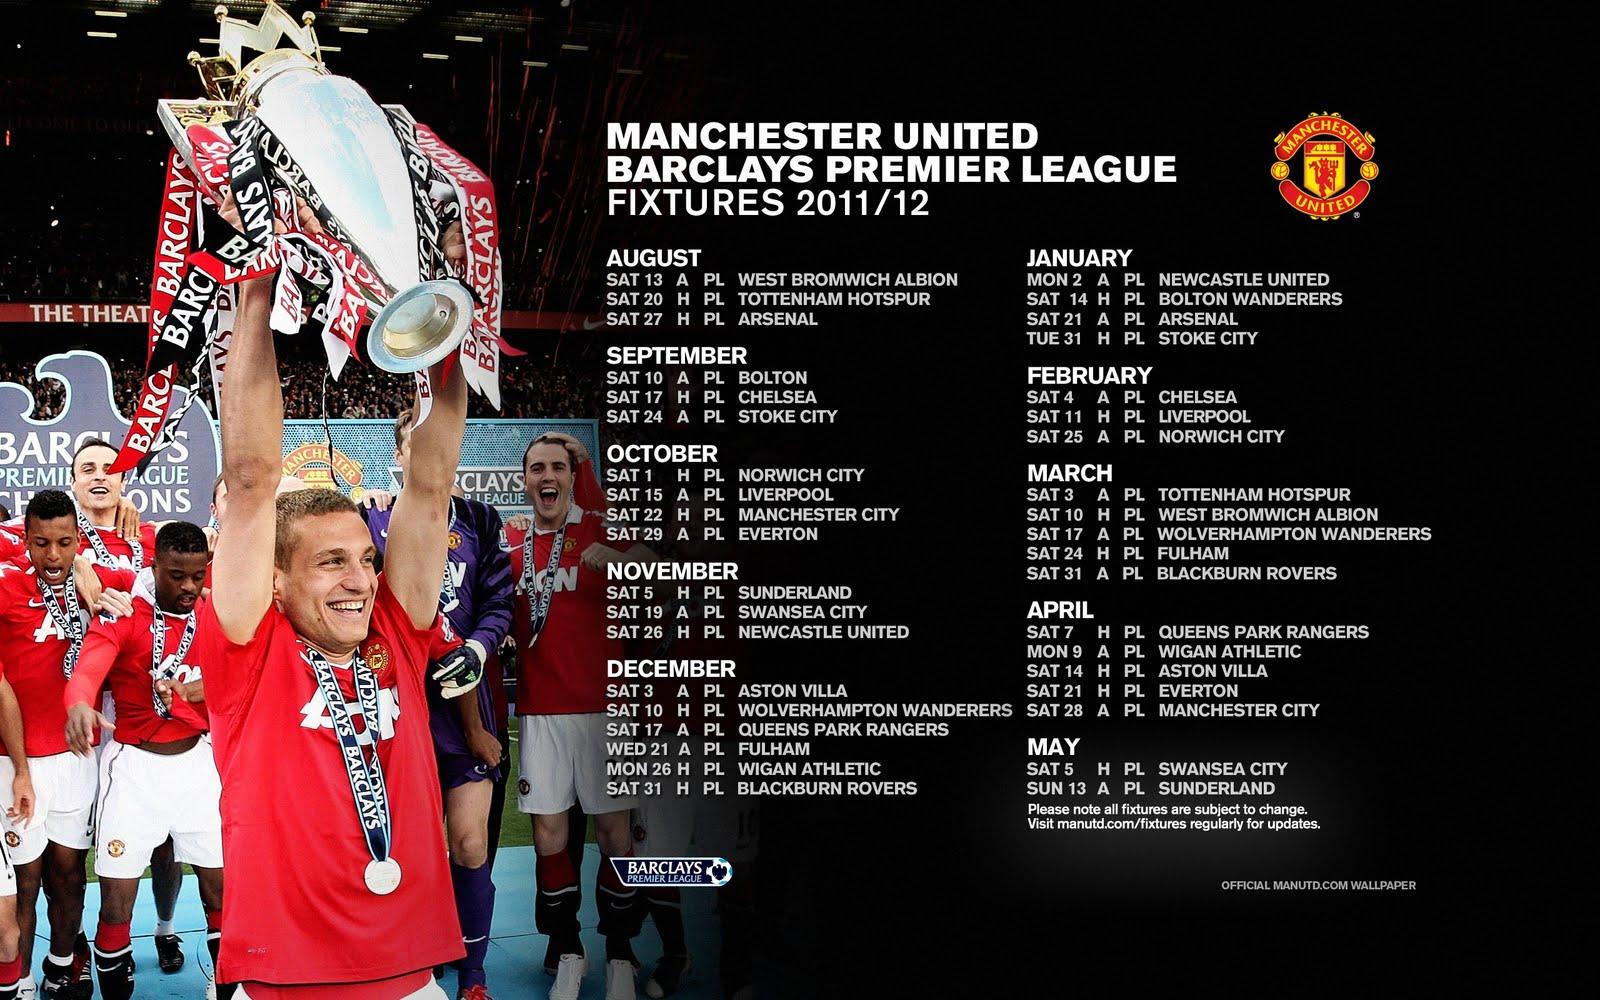 http://4.bp.blogspot.com/-AwE2e6sk8po/Tfthno3qsgI/AAAAAAAAFT0/5JJv6C98QJo/s1600/Man+United+Fixtures+2011+2012.jpg